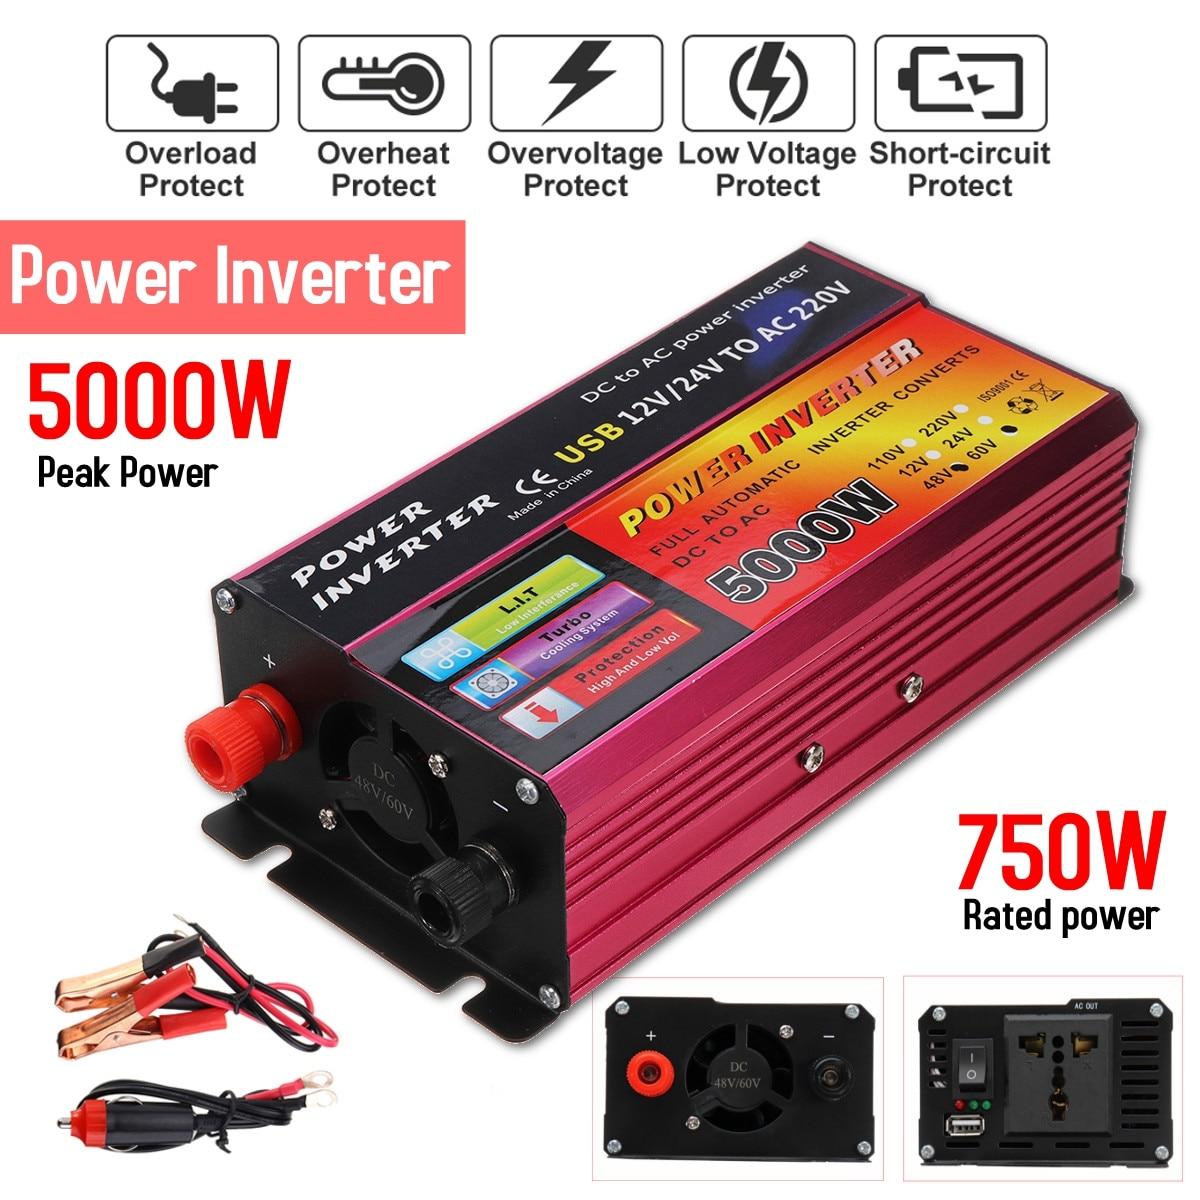 Inverter 12V/24V 220V 5000W Peak Power Inverter Voltage Convertor Transformer 48V/60V Automatic Adaptable